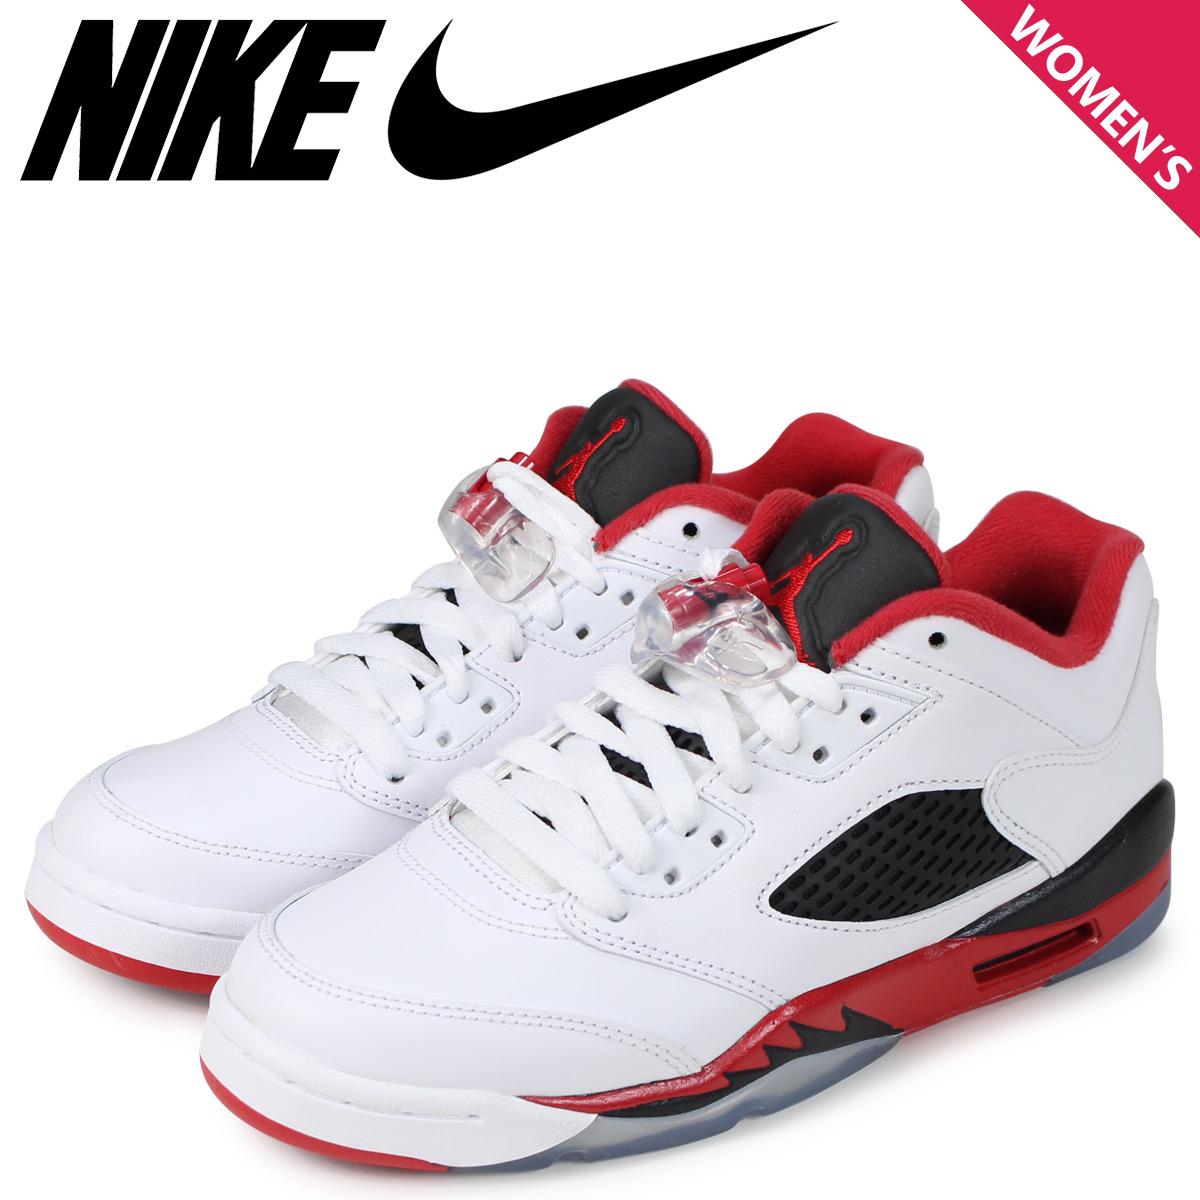 e7e1ad1693bd14 NIKE Nike Air Jordan 5 nostalgic lady s sneakers AIR JORDAN 5 RETRO LOW GS  FIRE RED white 314